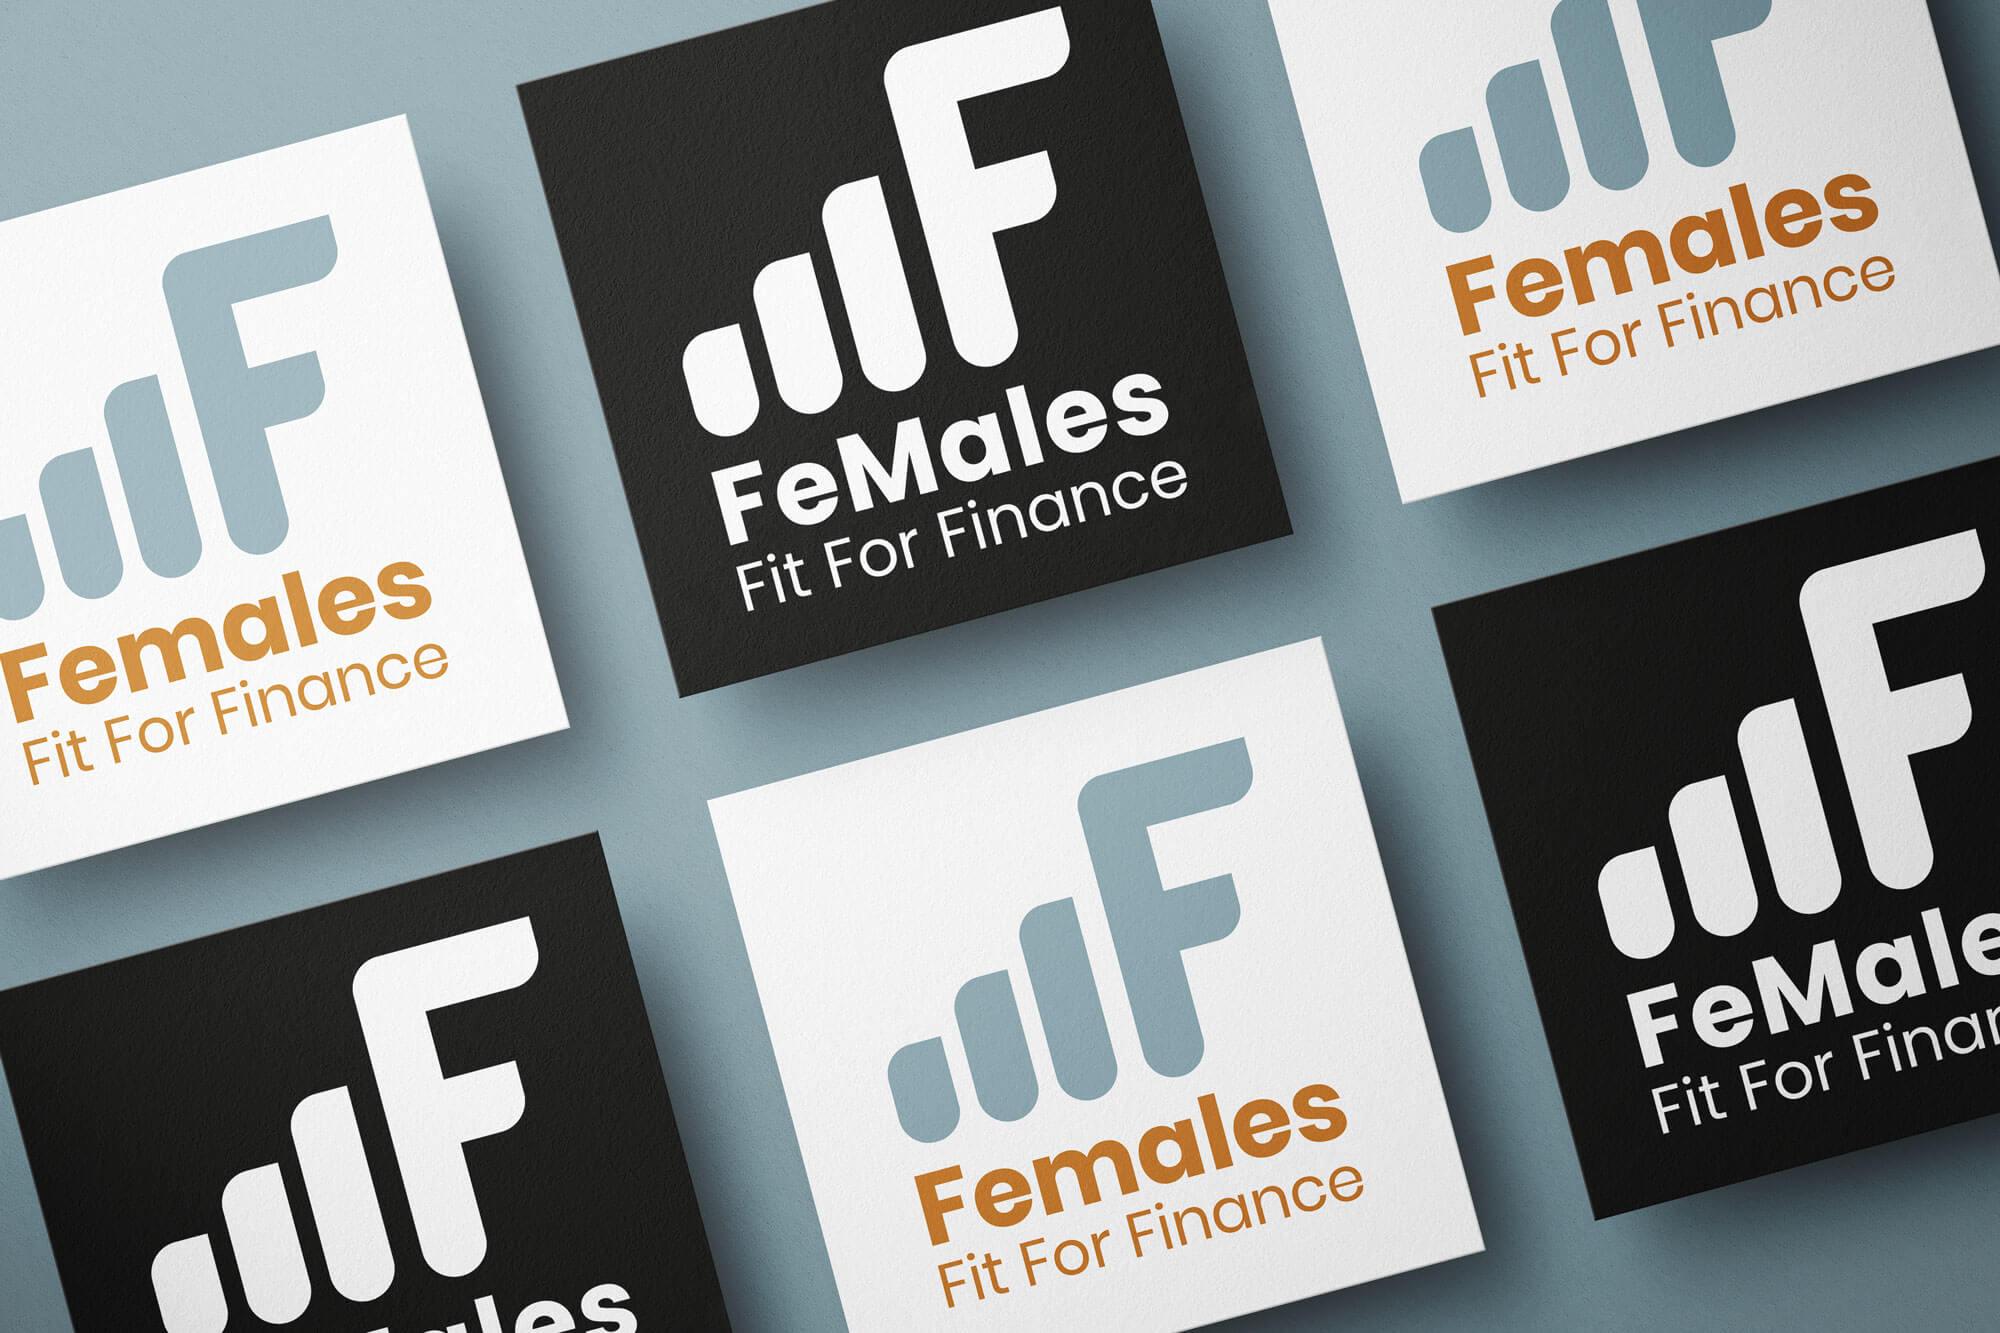 Females Fit for Finance Mockup